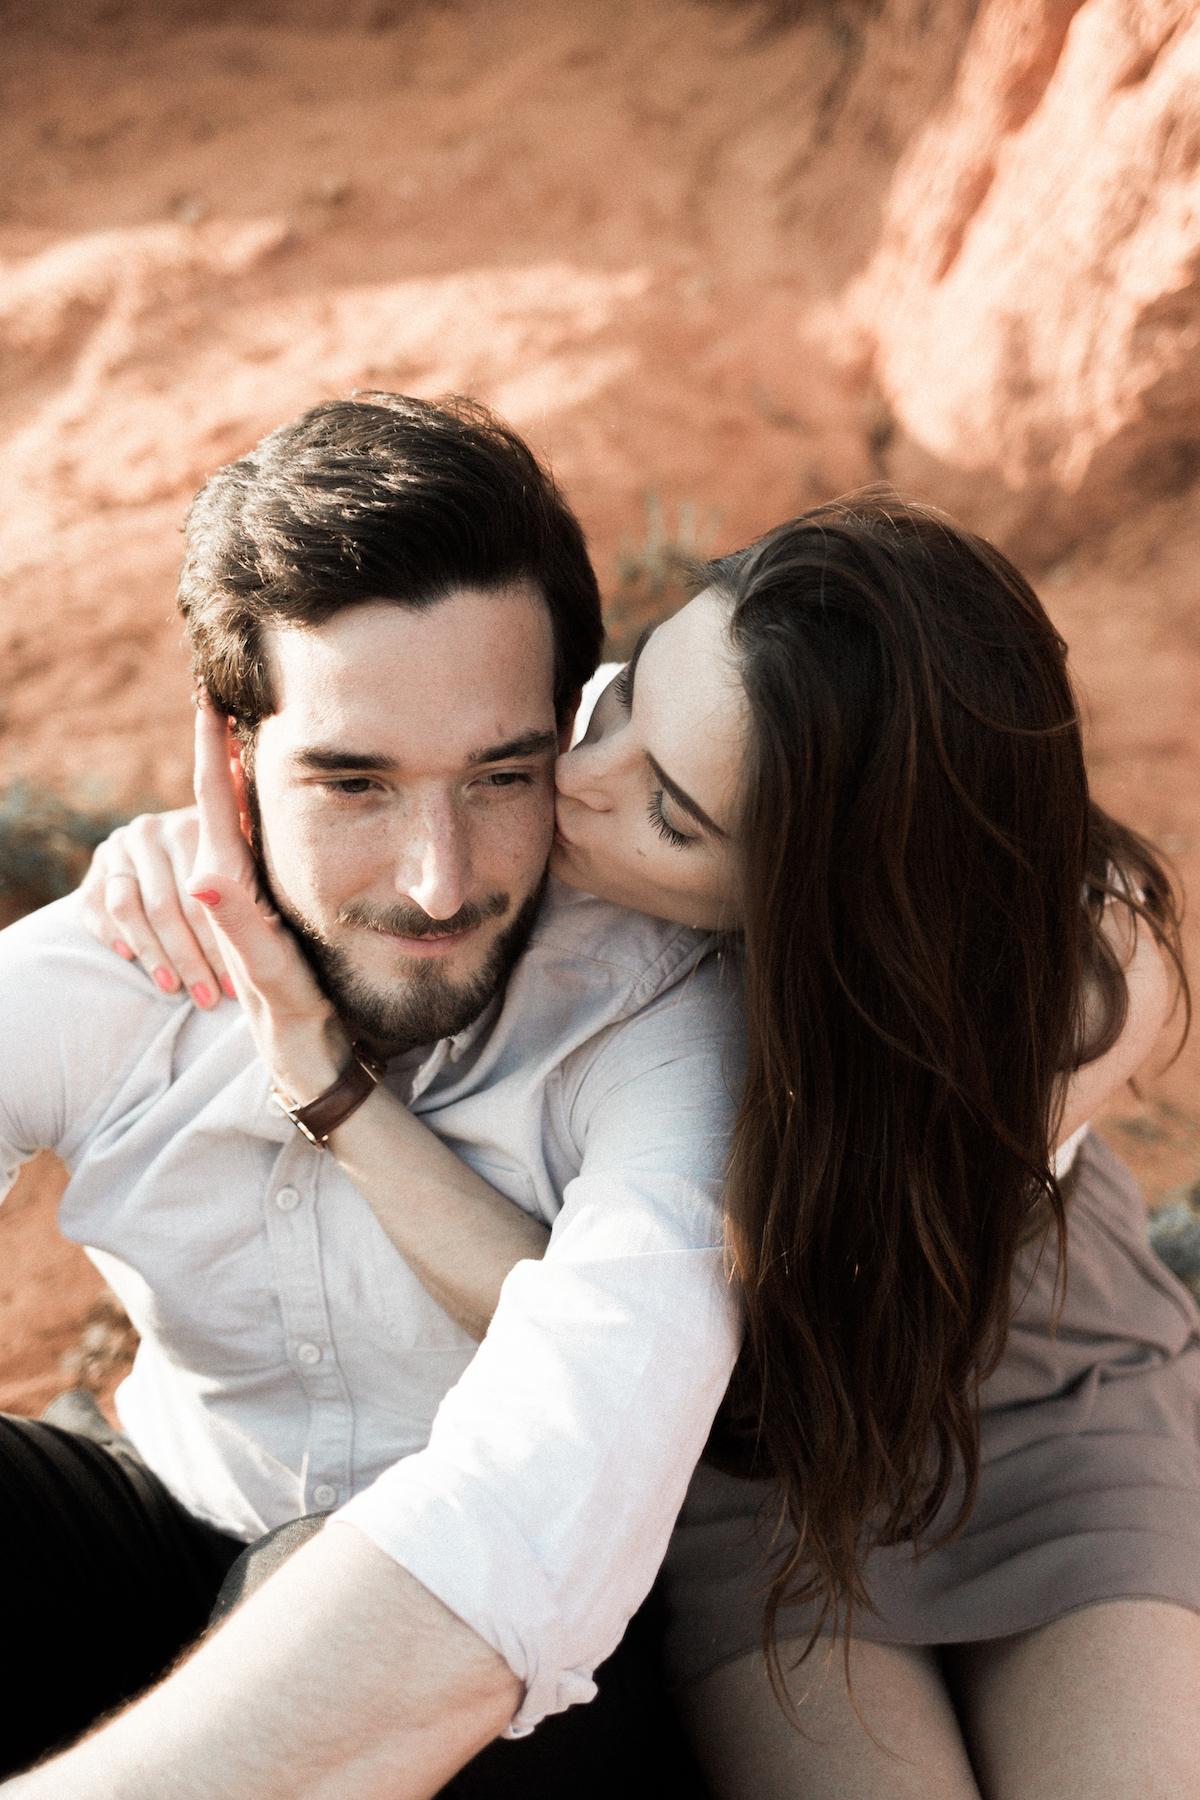 seance-couple-colorado-provence-61.jpg